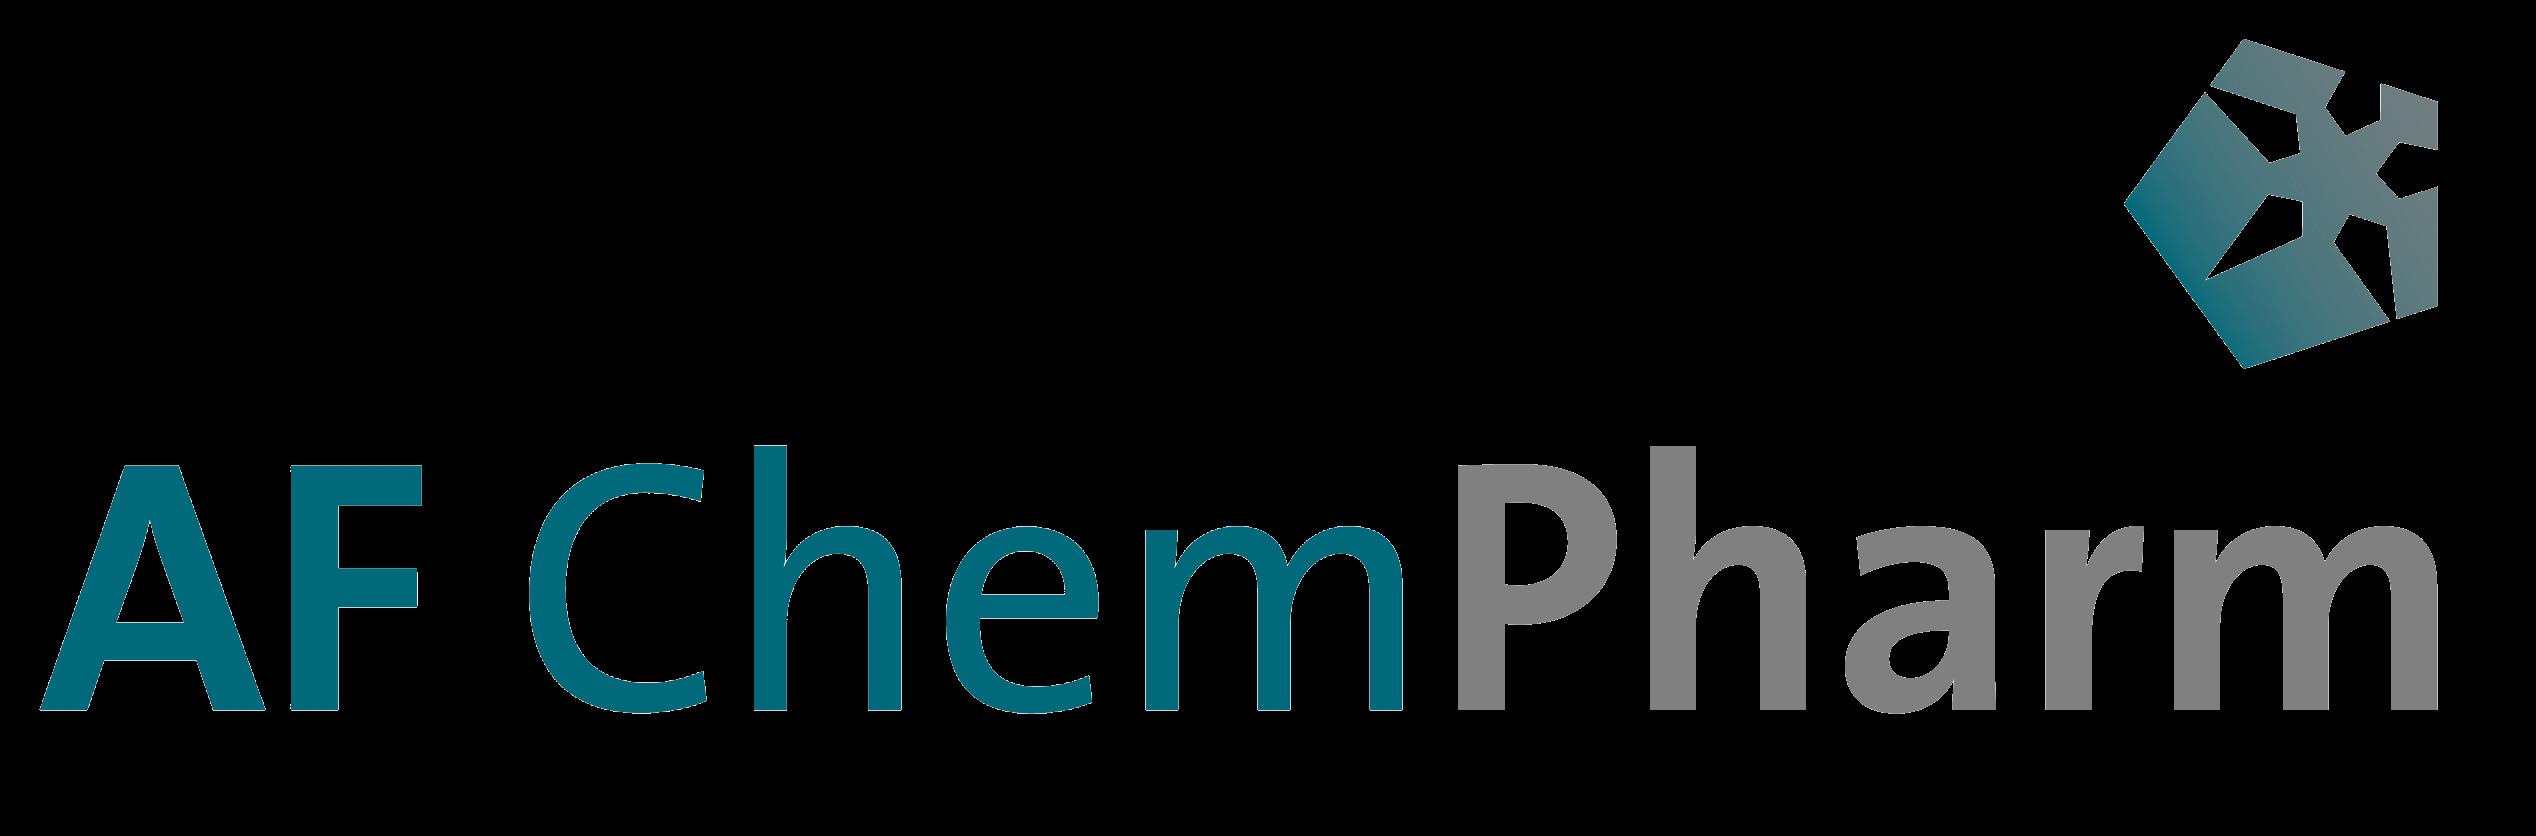 AF ChemPharm